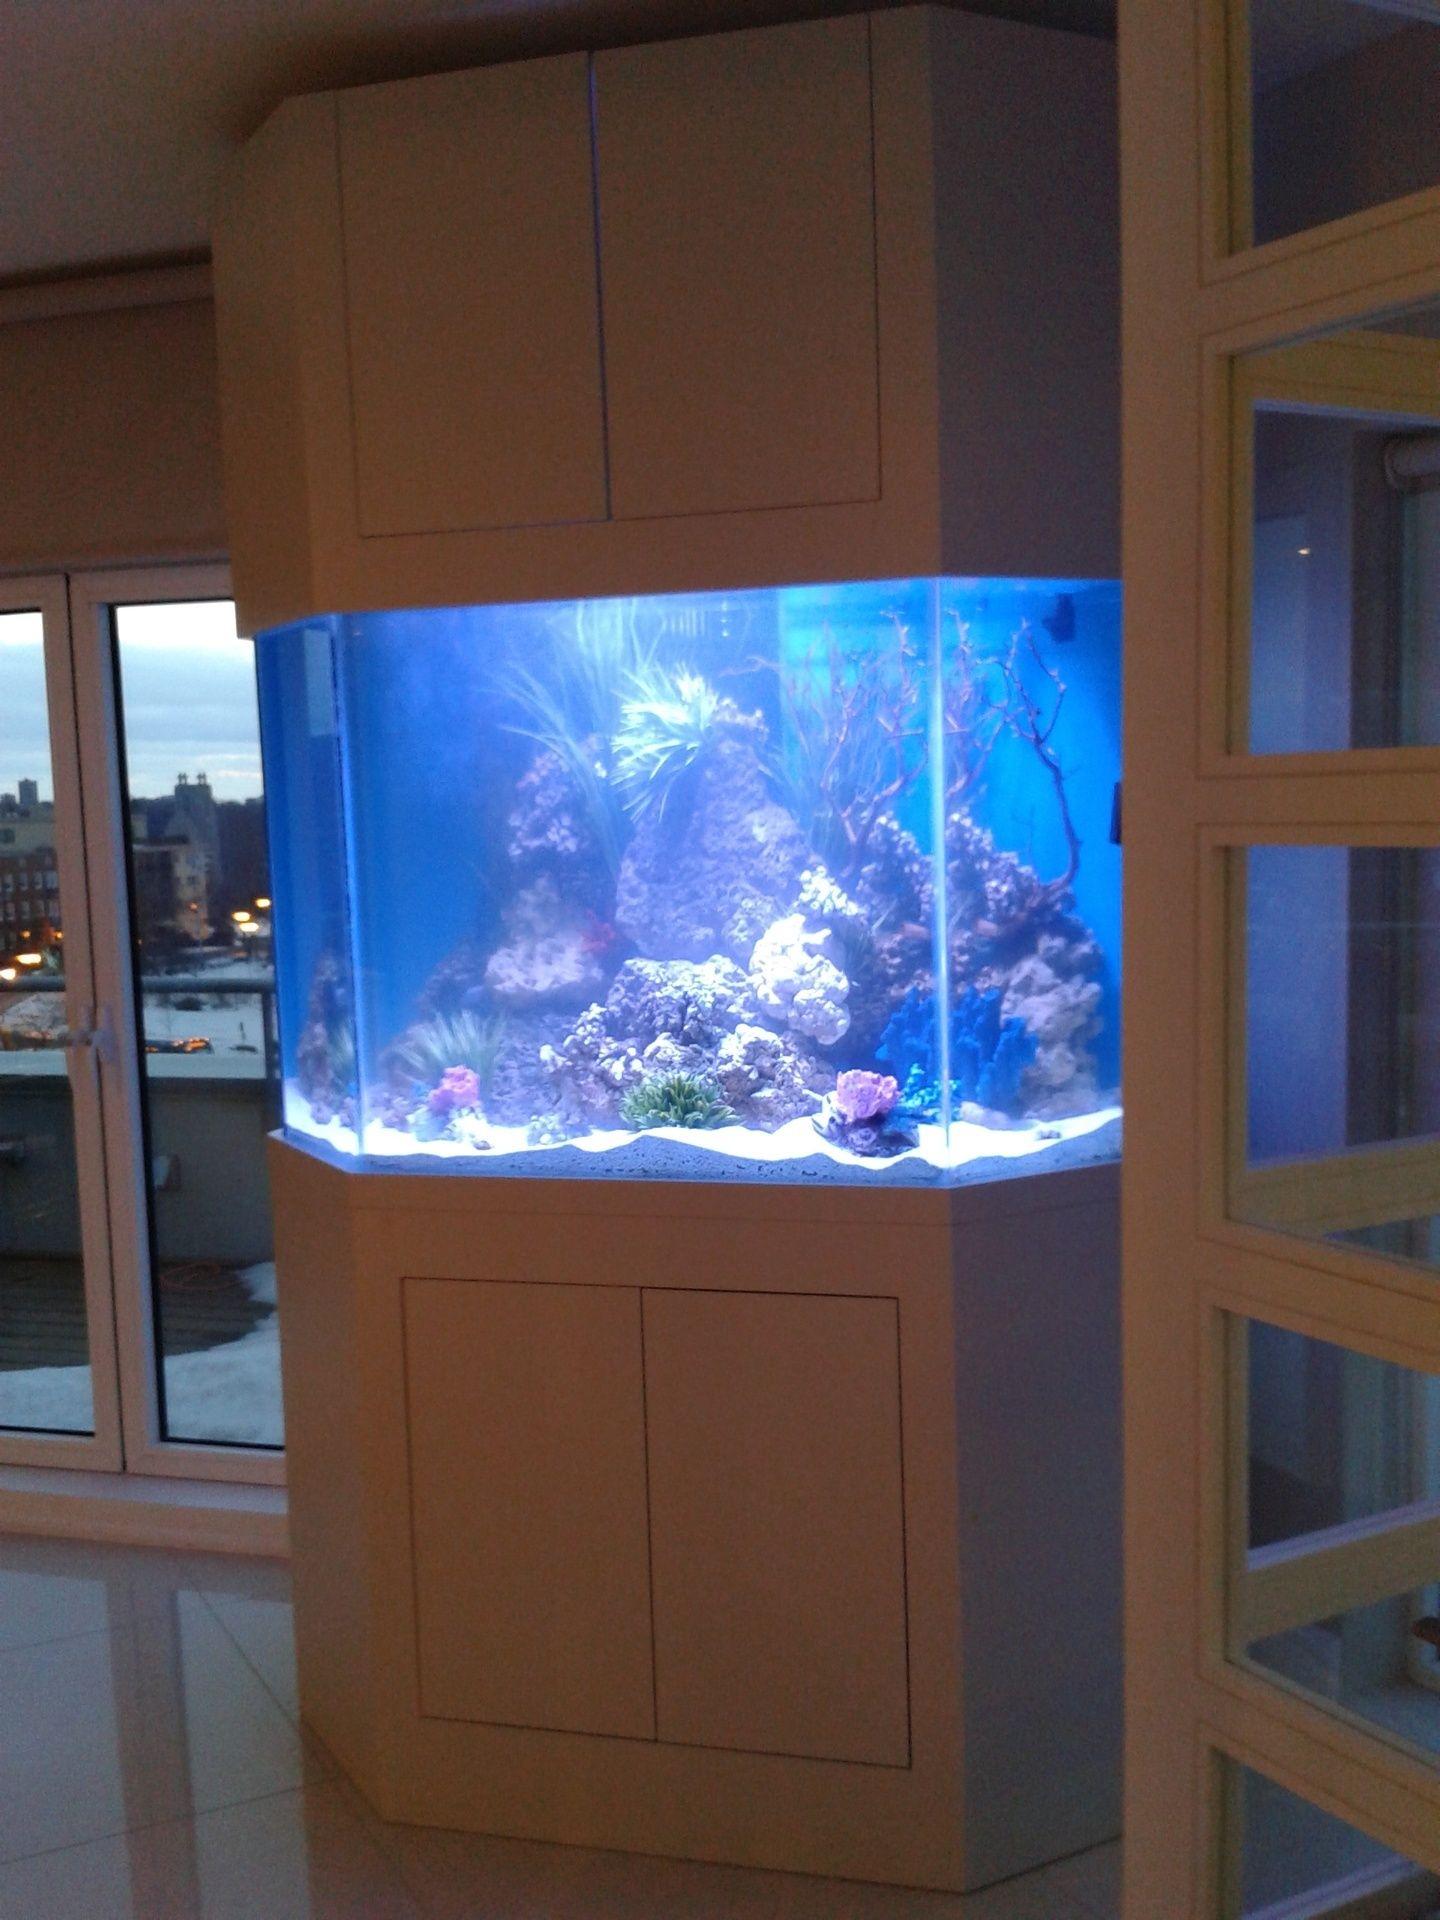 Aquarium 500 gallons eau salée.